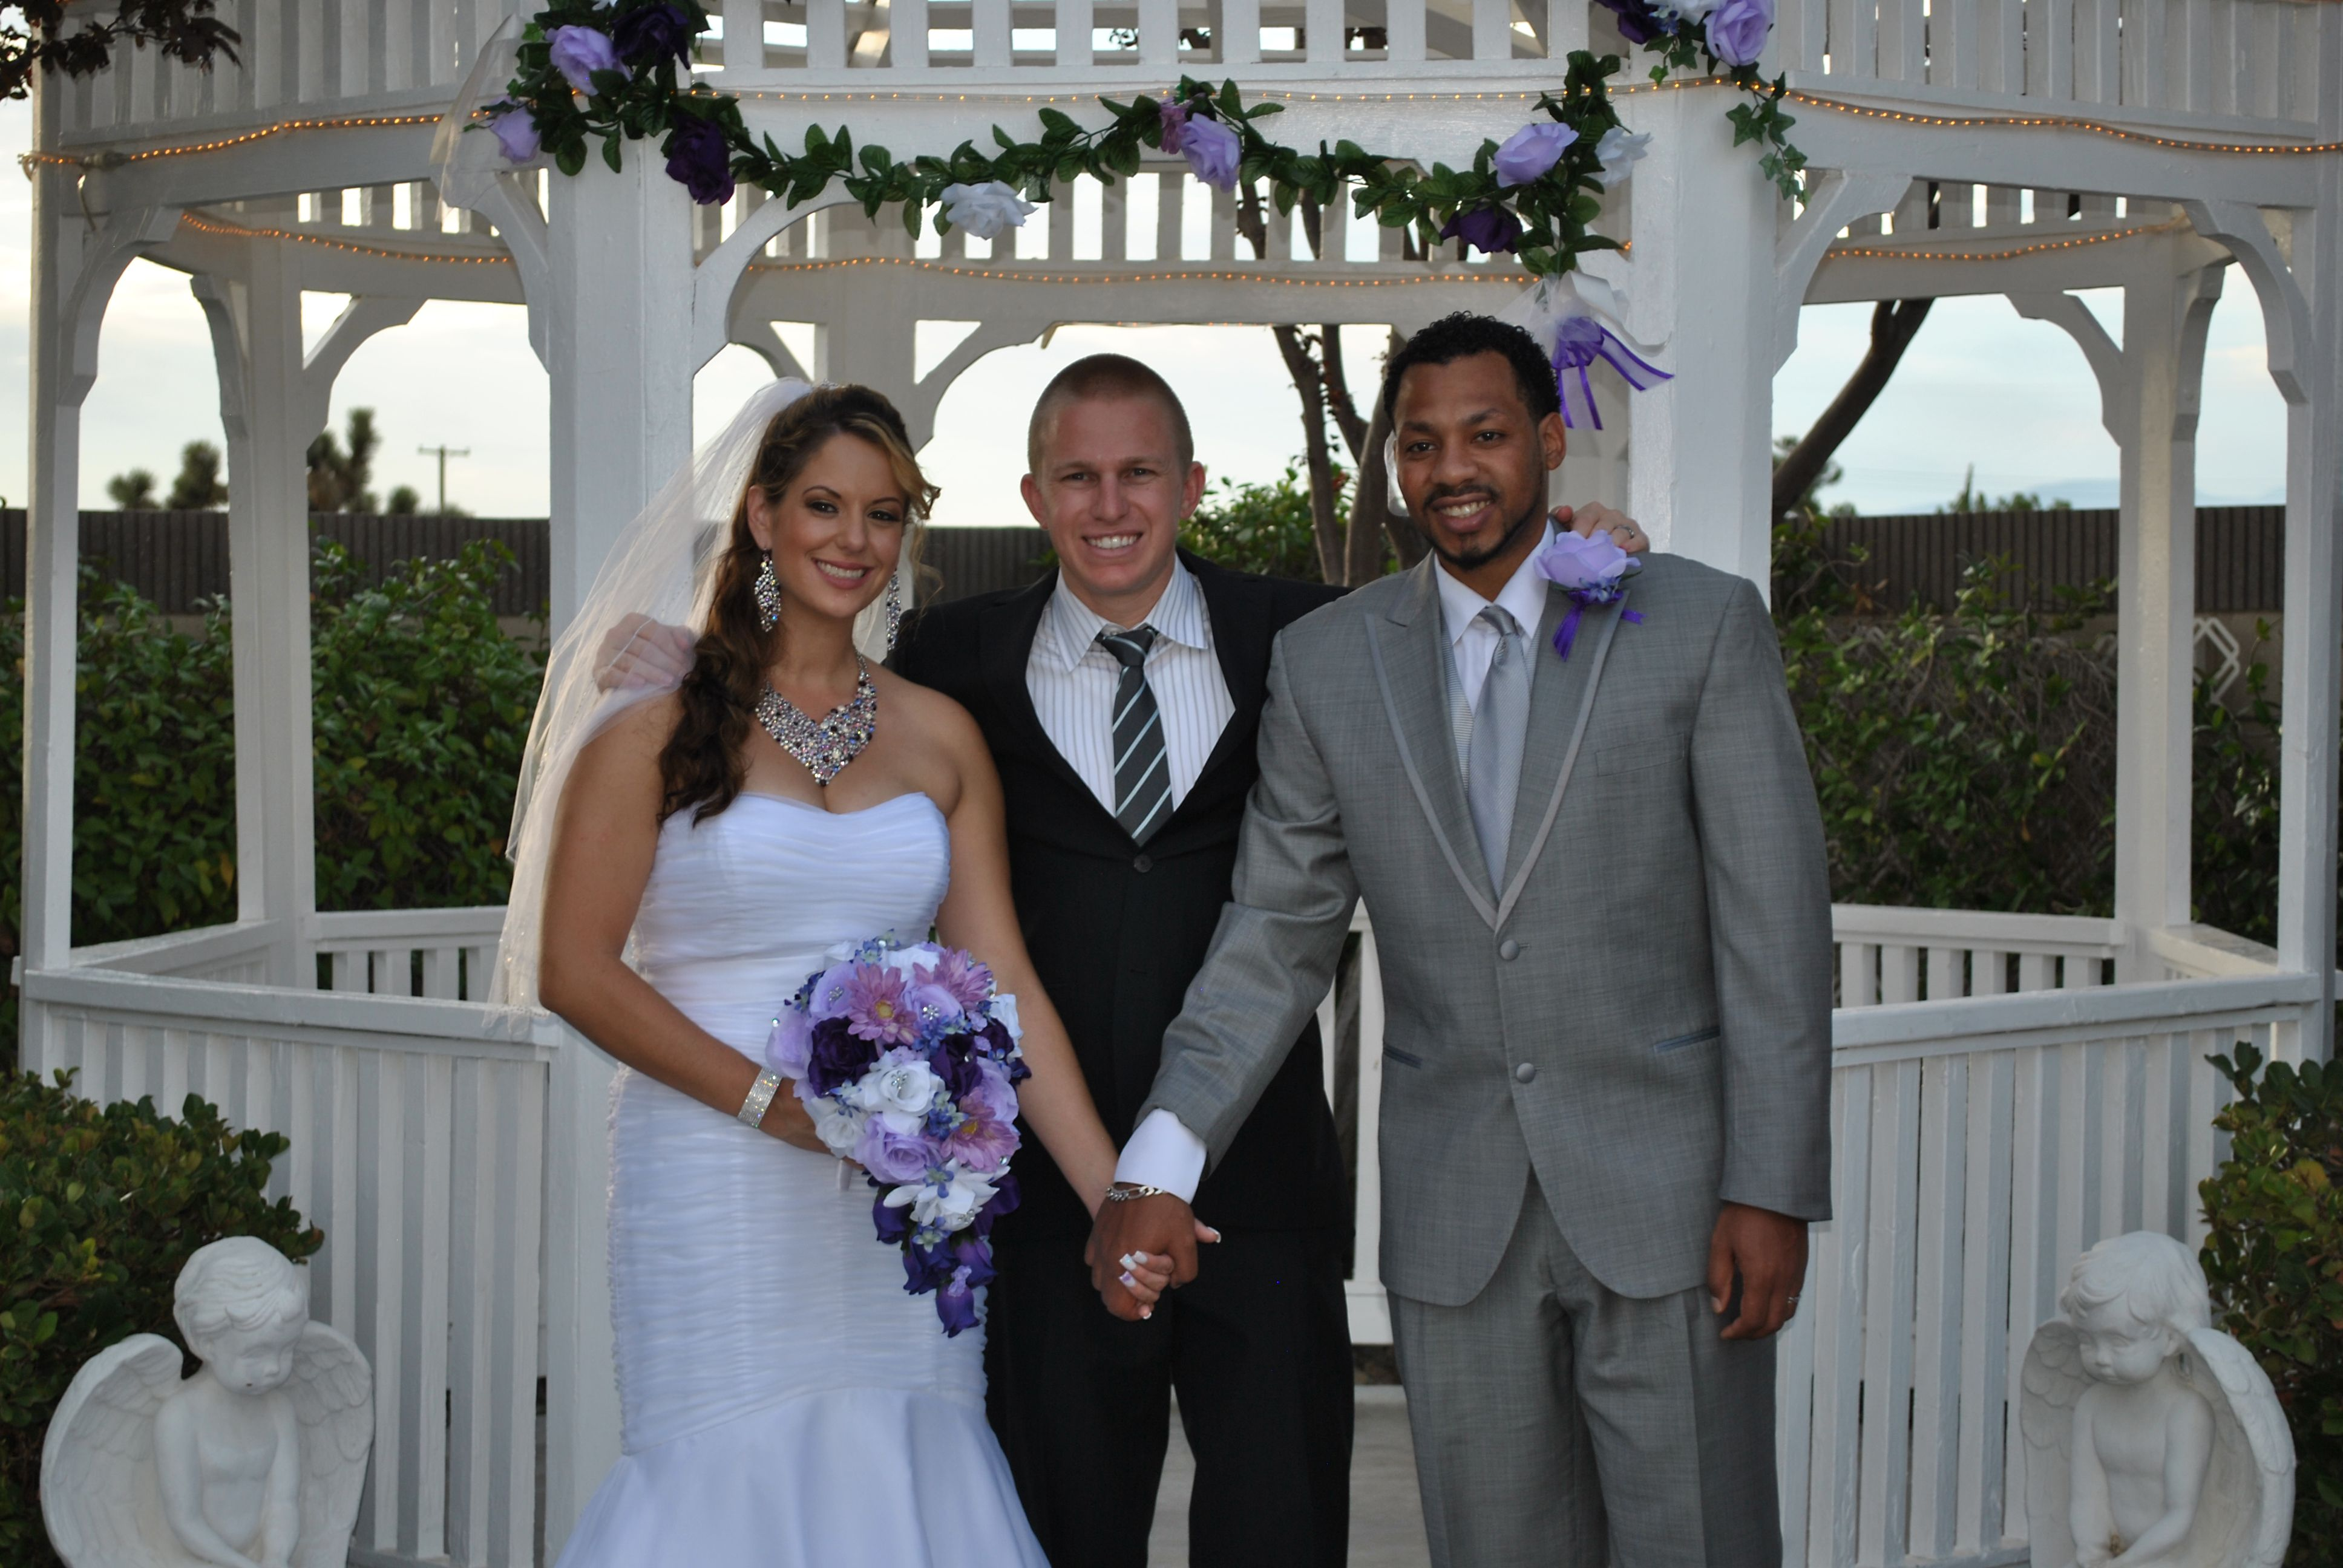 Wedding Photography Anthony Moore Ampland Photography